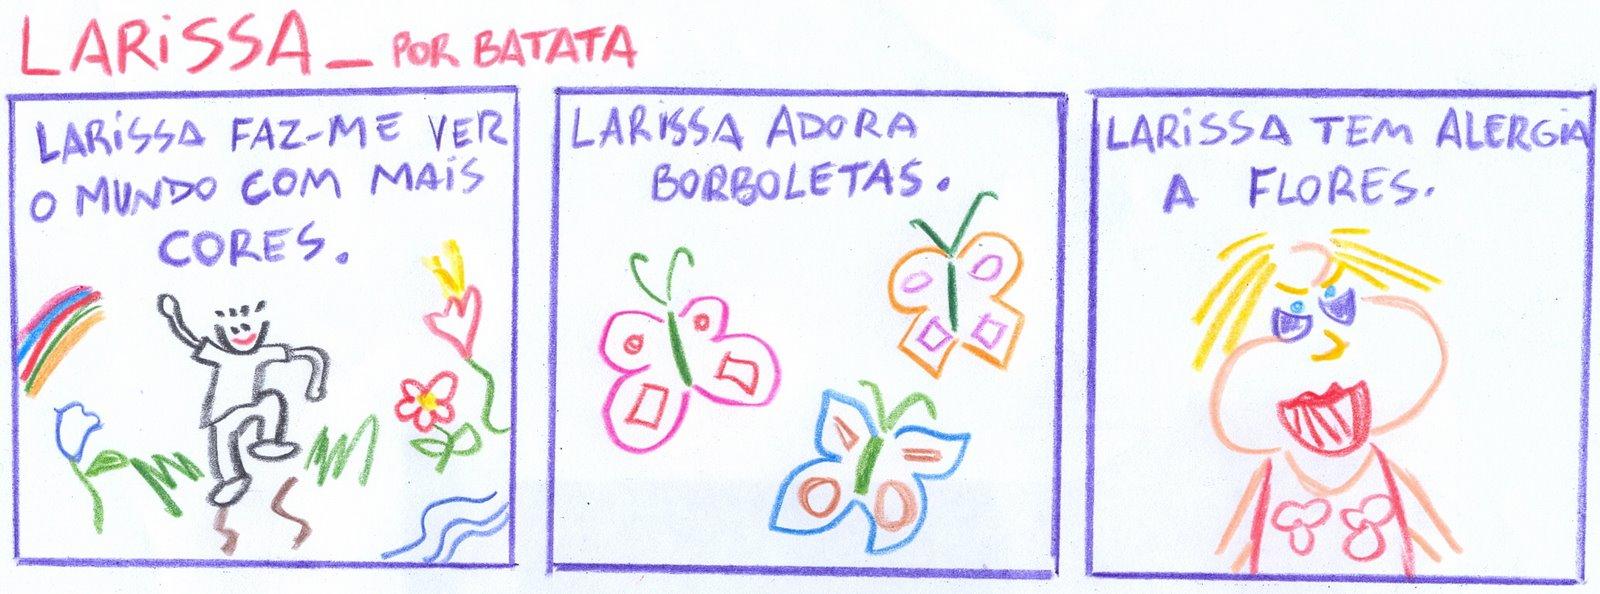 [Larissa+]